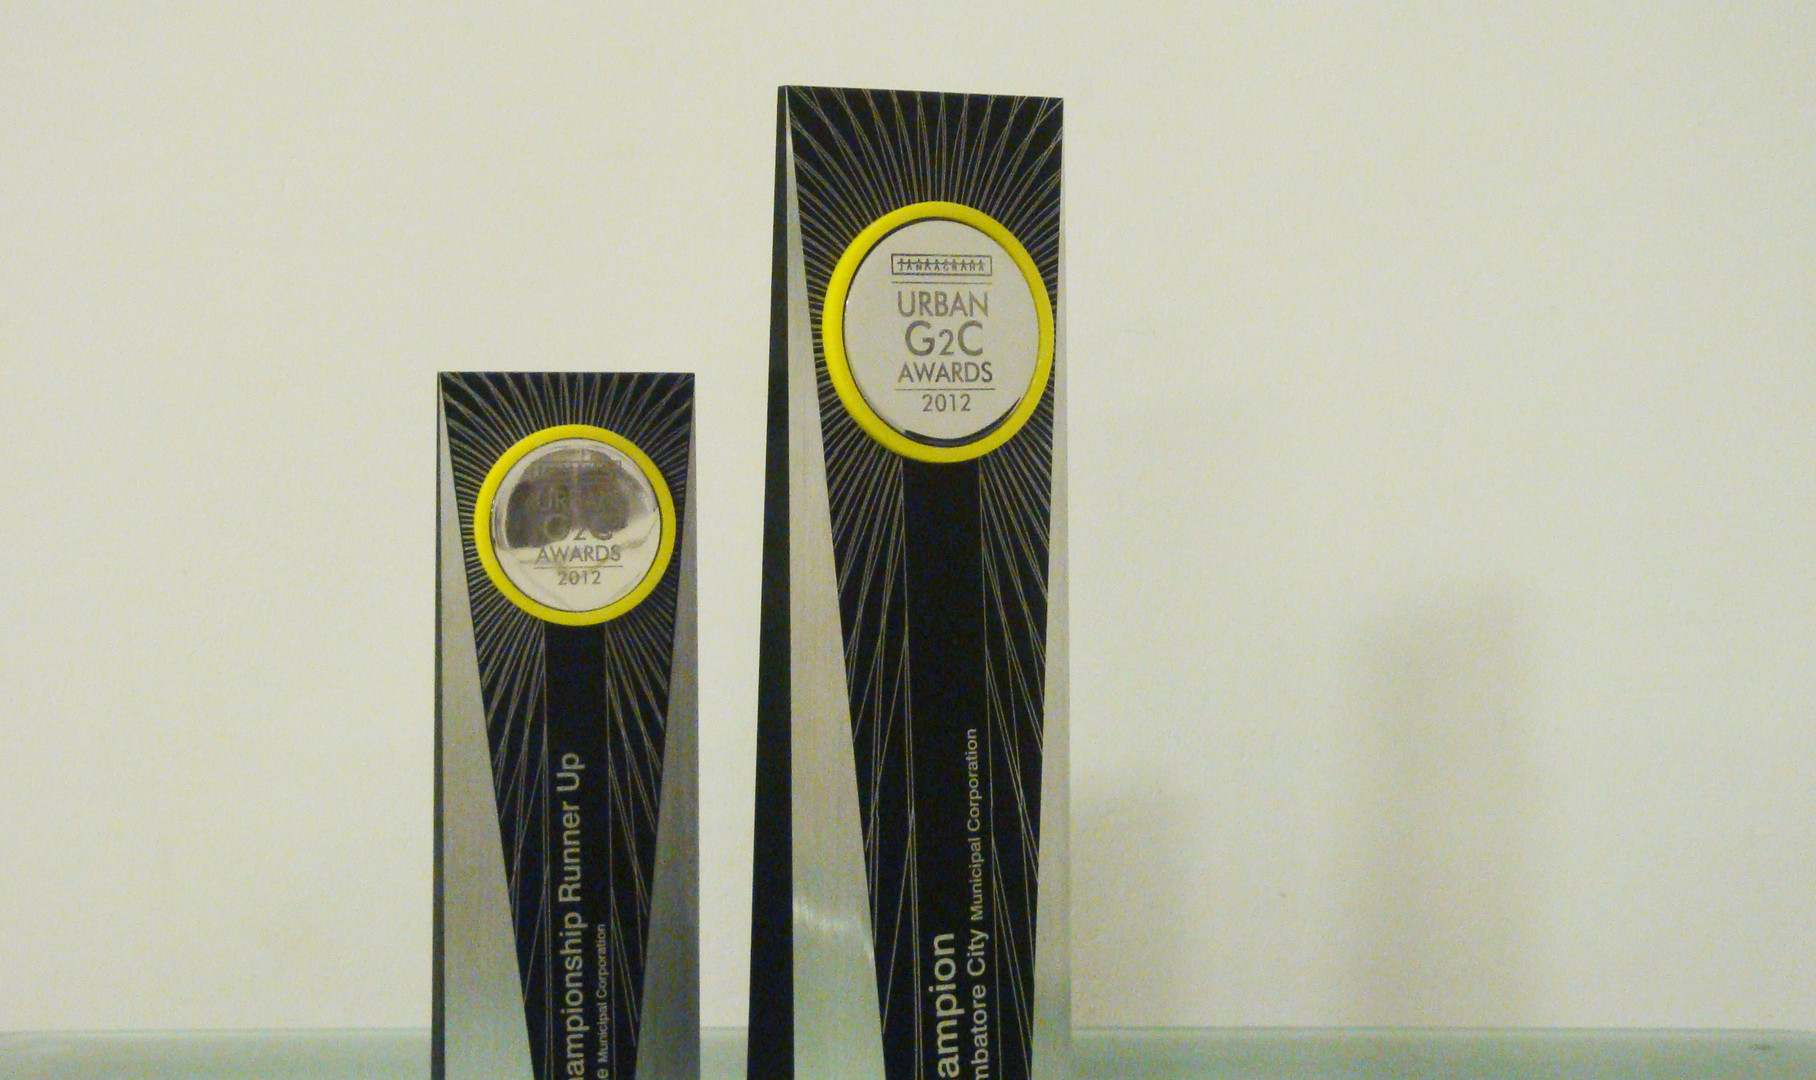 Jana Urban G2C Awards